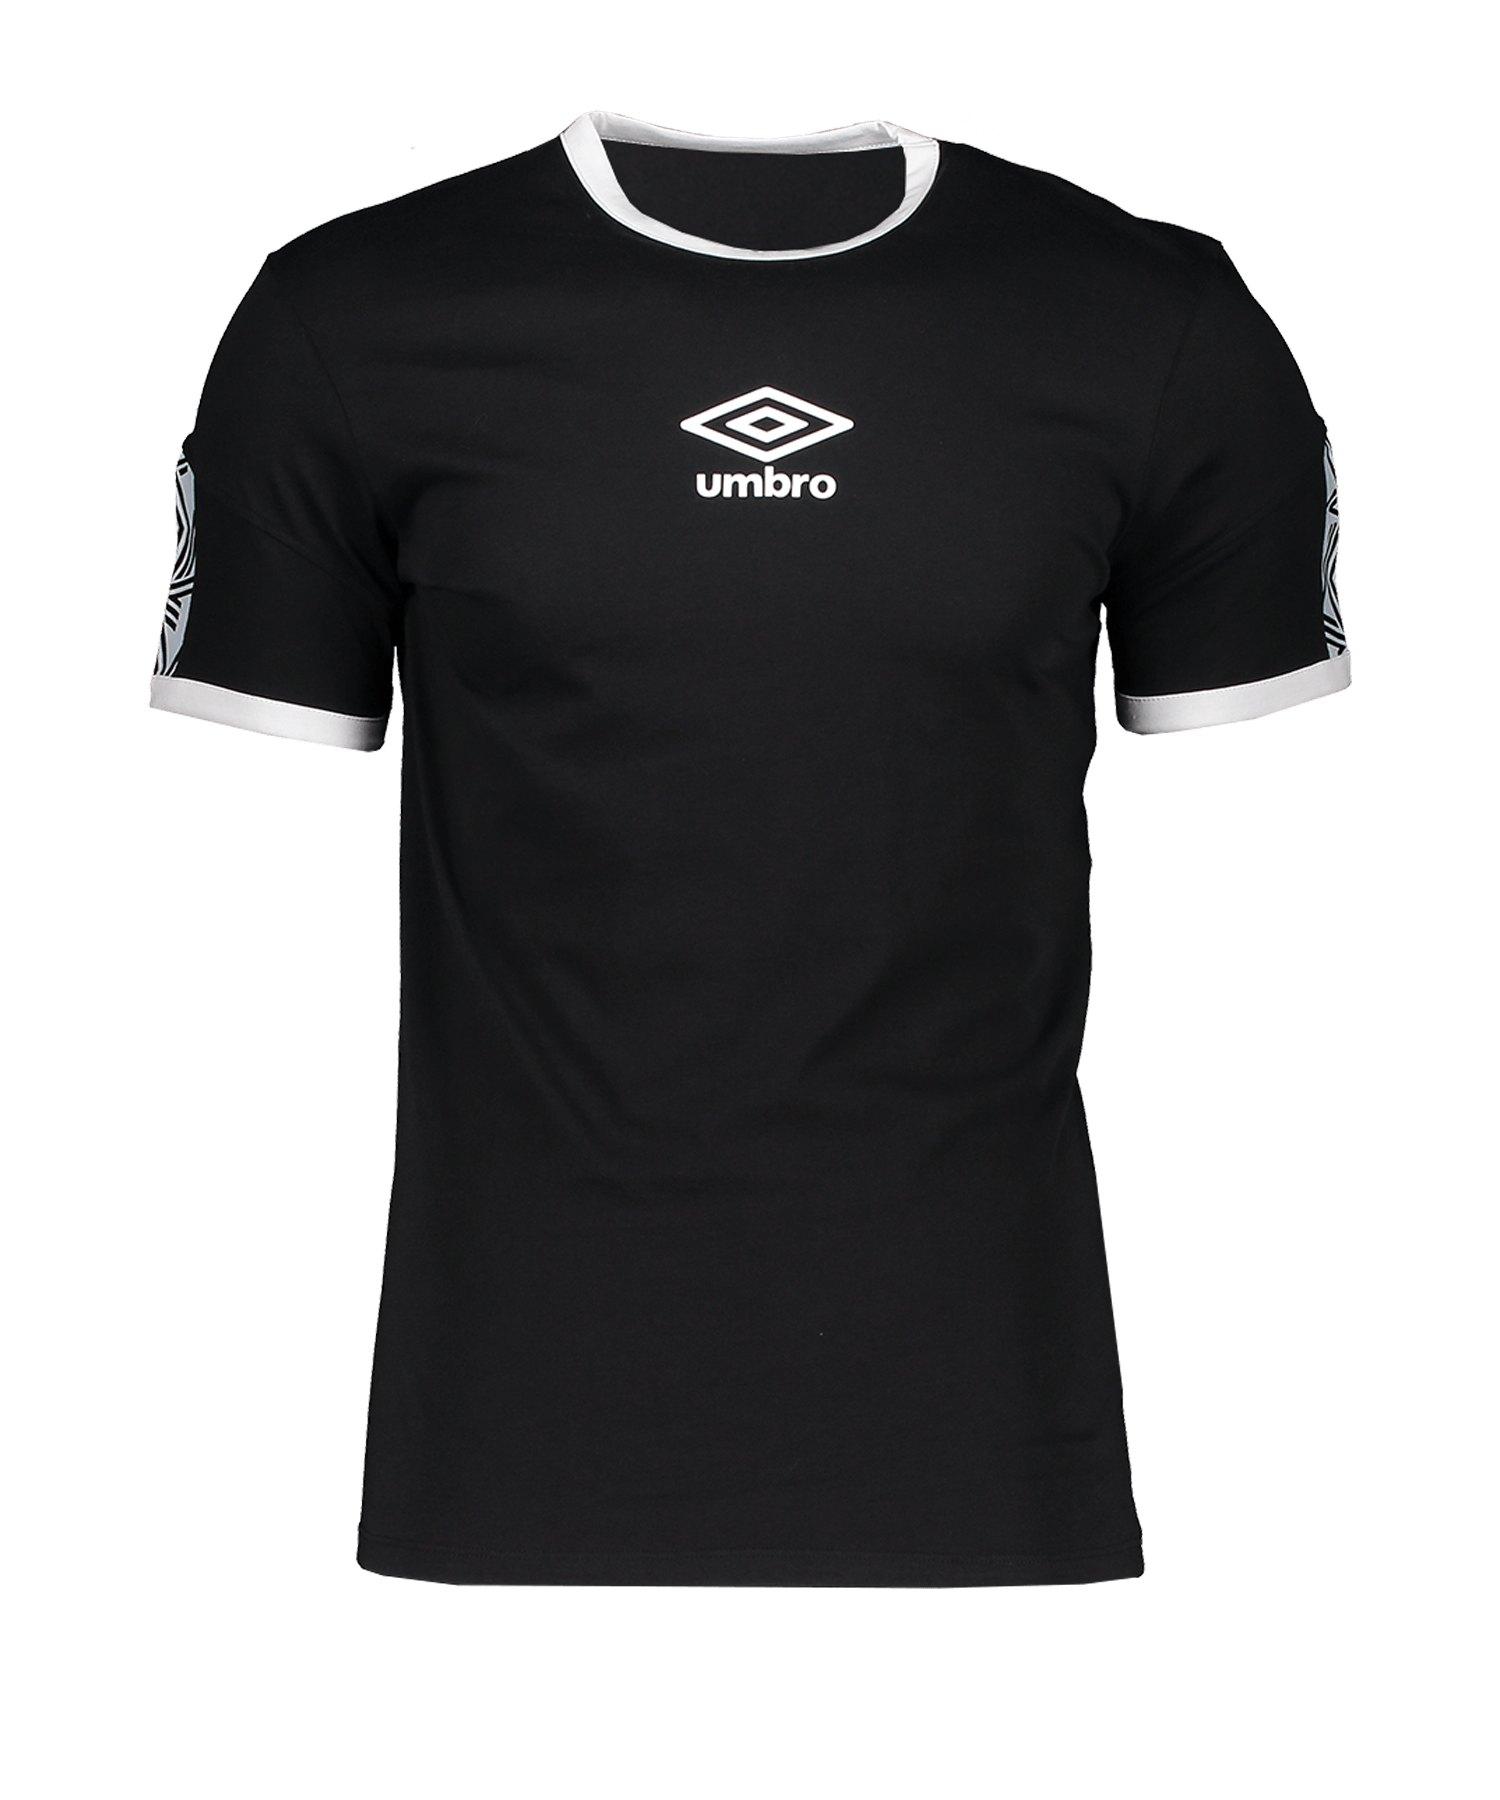 Umbro Ringer Taped Logo Tee T-Shirt Schwarz FL3 - schwarz